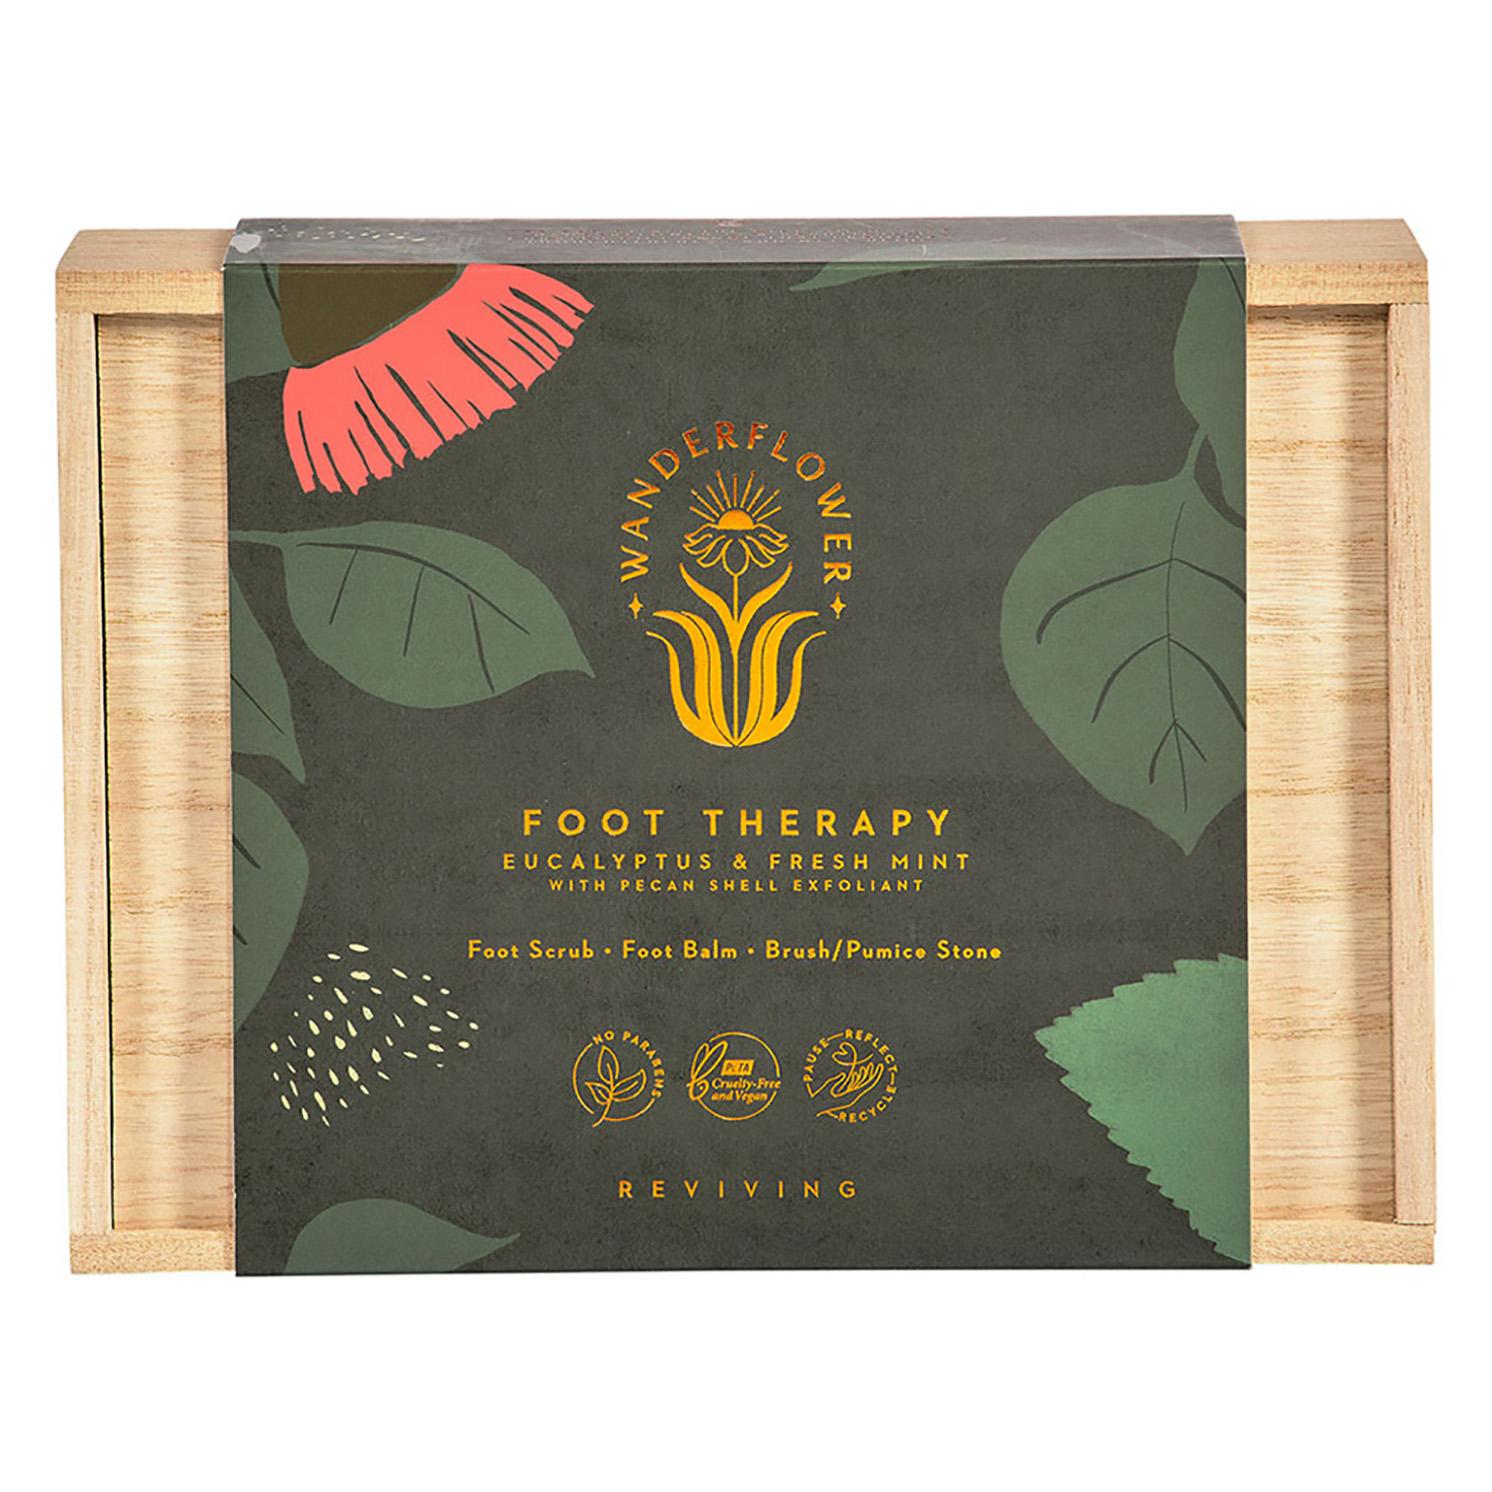 Wanderflower – Eucalyptus & Fresh Mint Foot Therapy Set in Wooden Gift Box